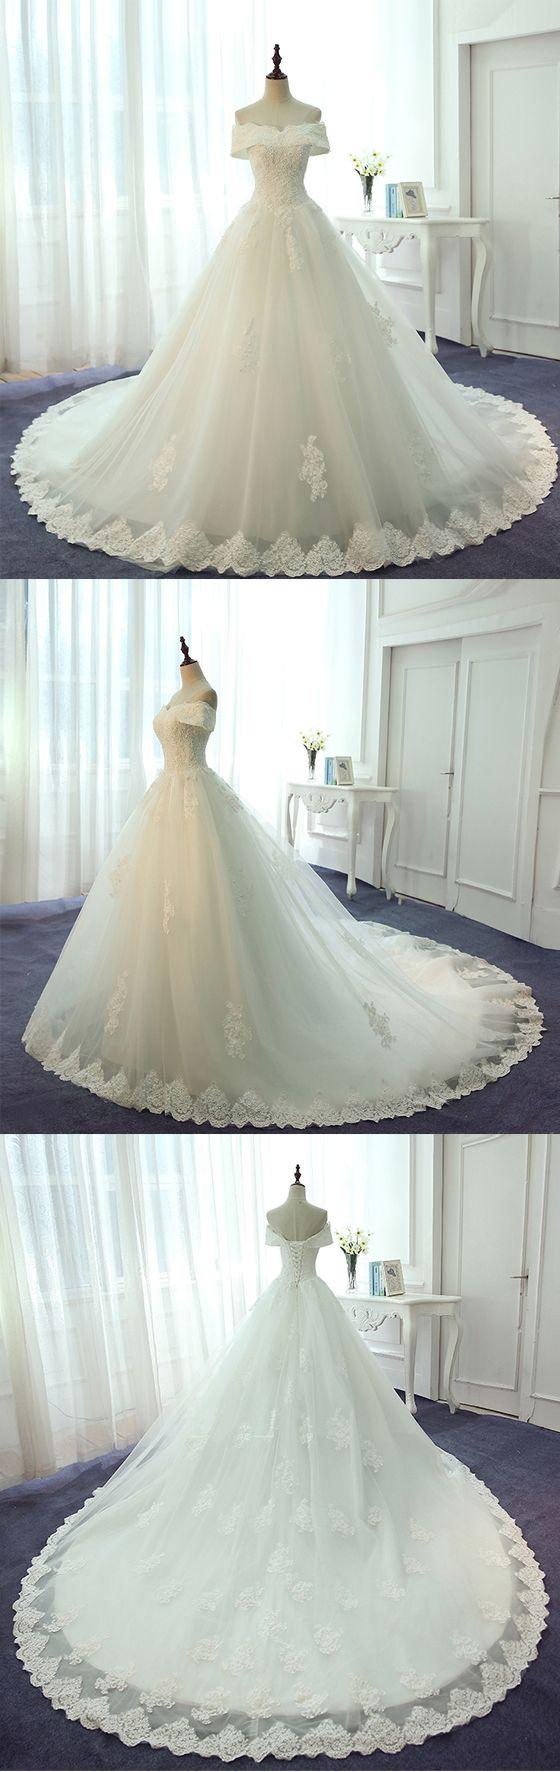 Off the Shoulder Lace Up Back Charming Lace Bridal Long Wedding Dresses, PM0634